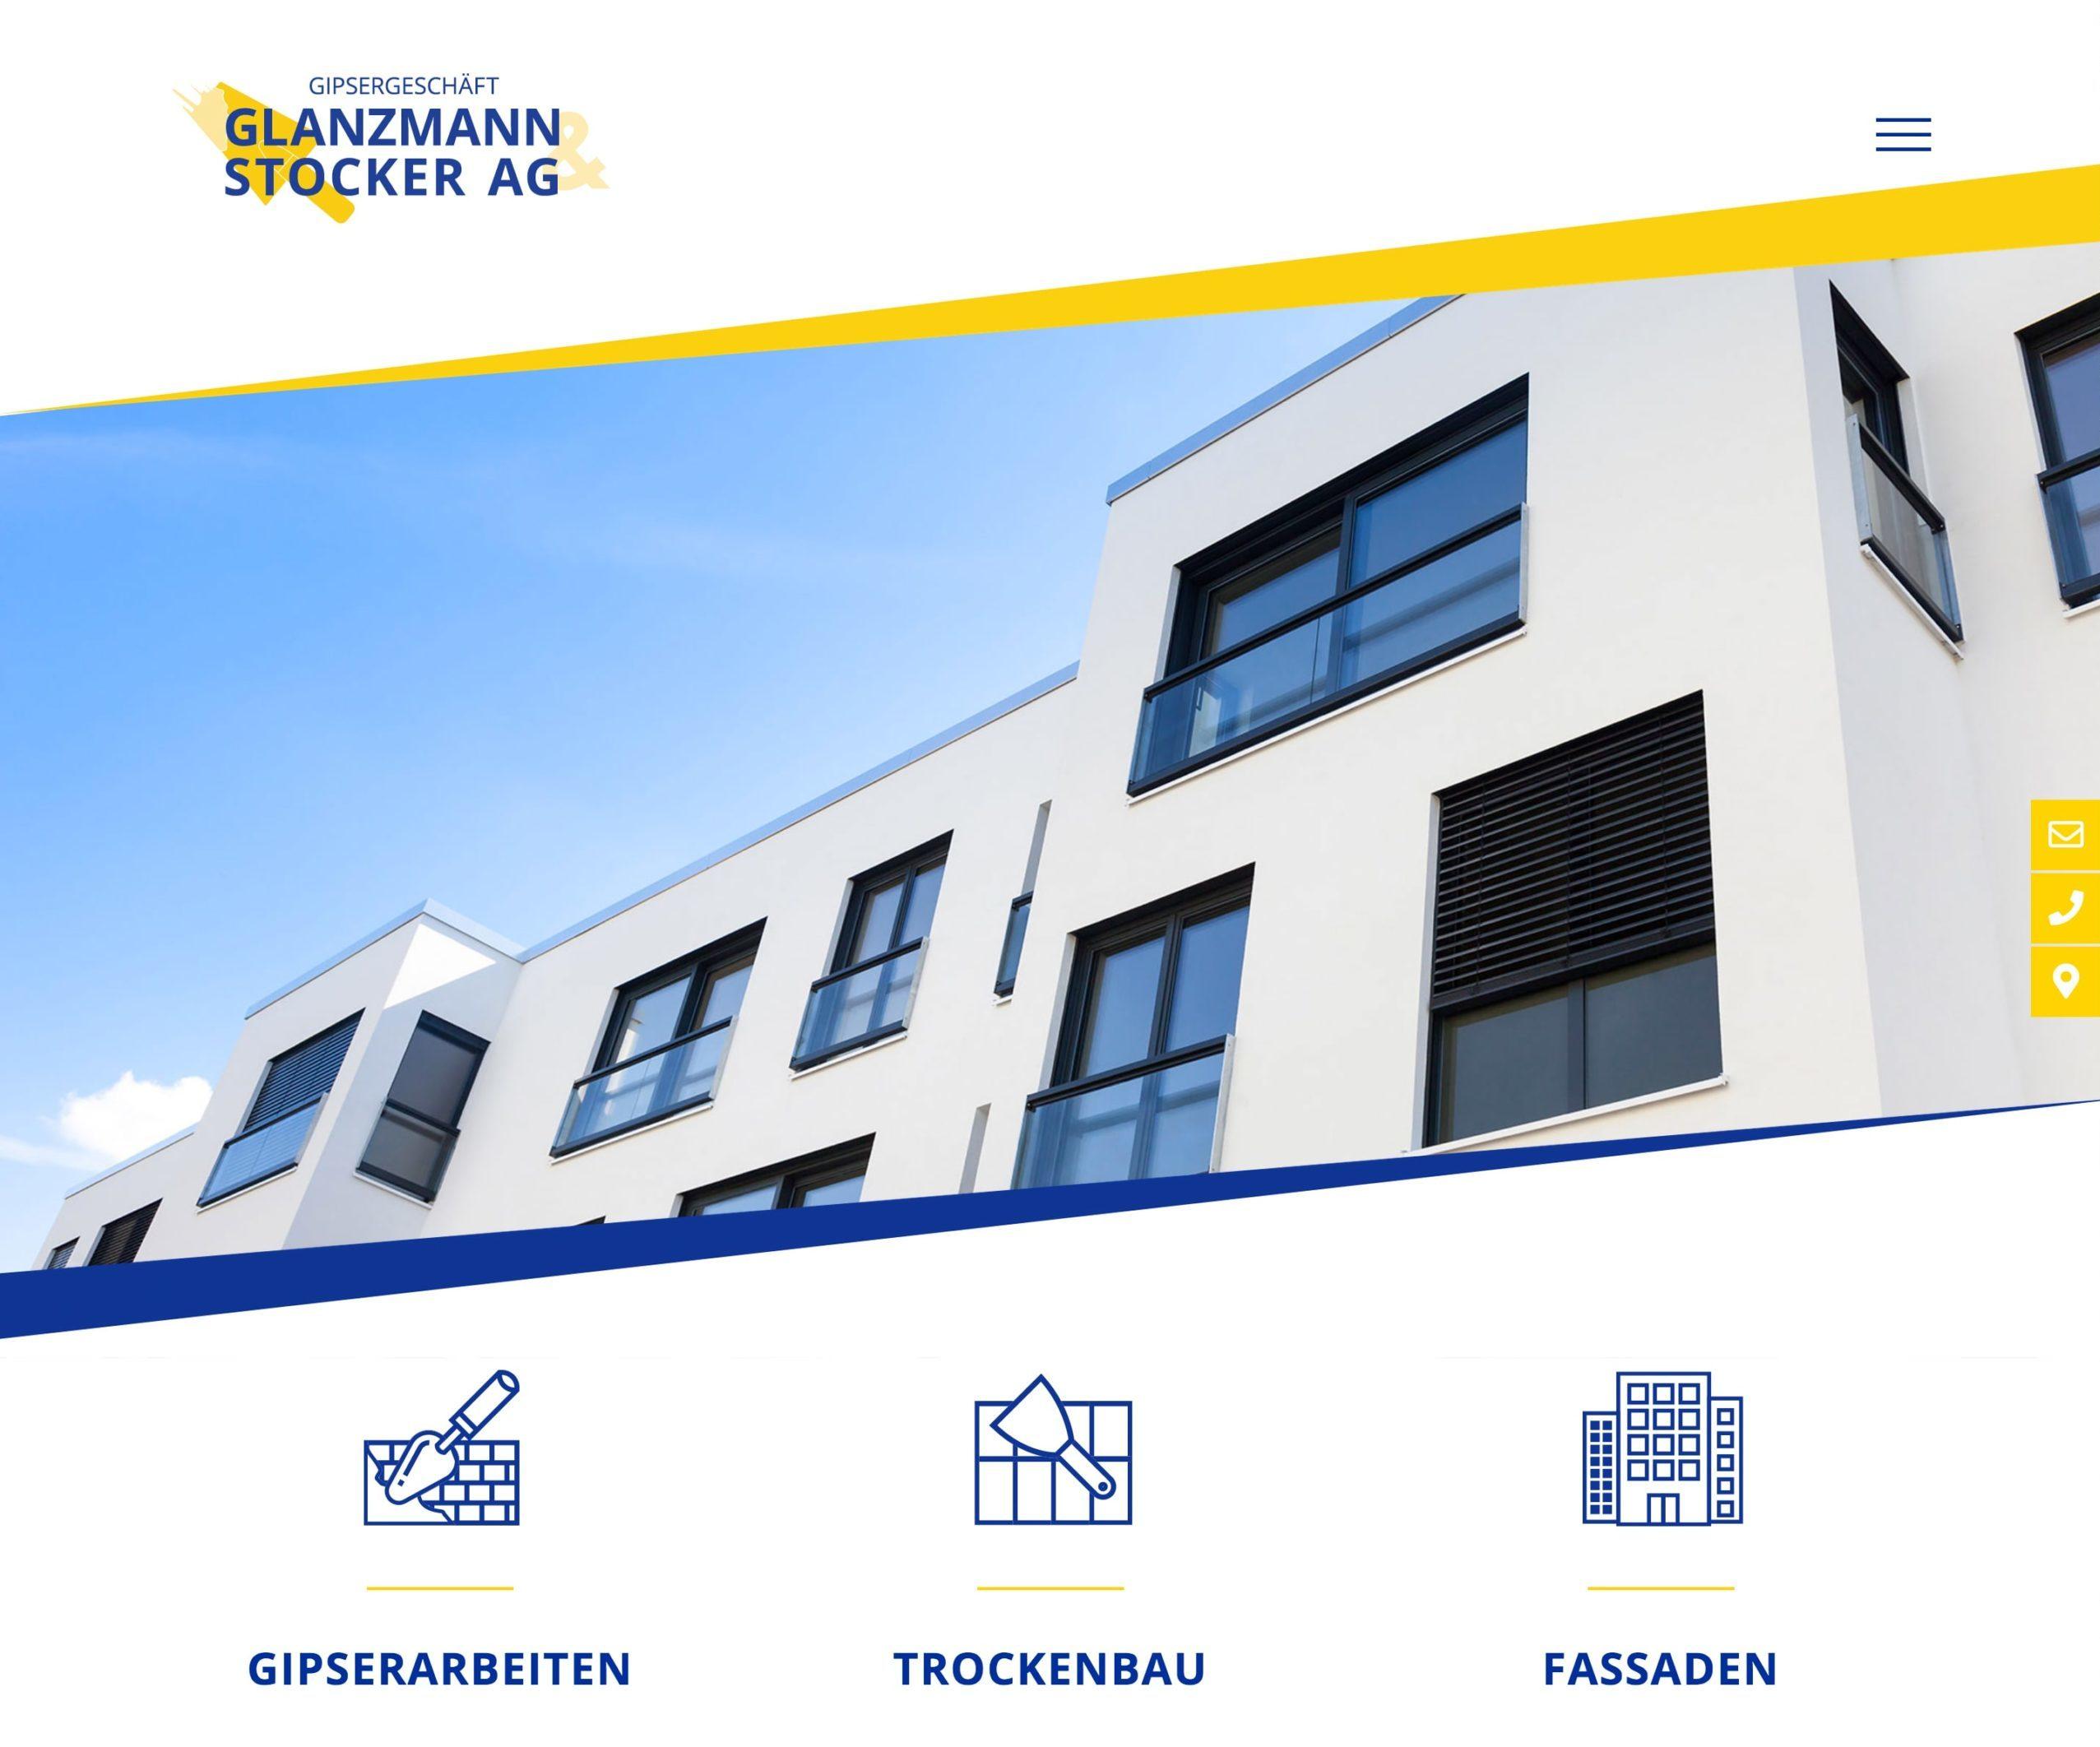 Conseo Portfolio | Glanzmann Stocker AG